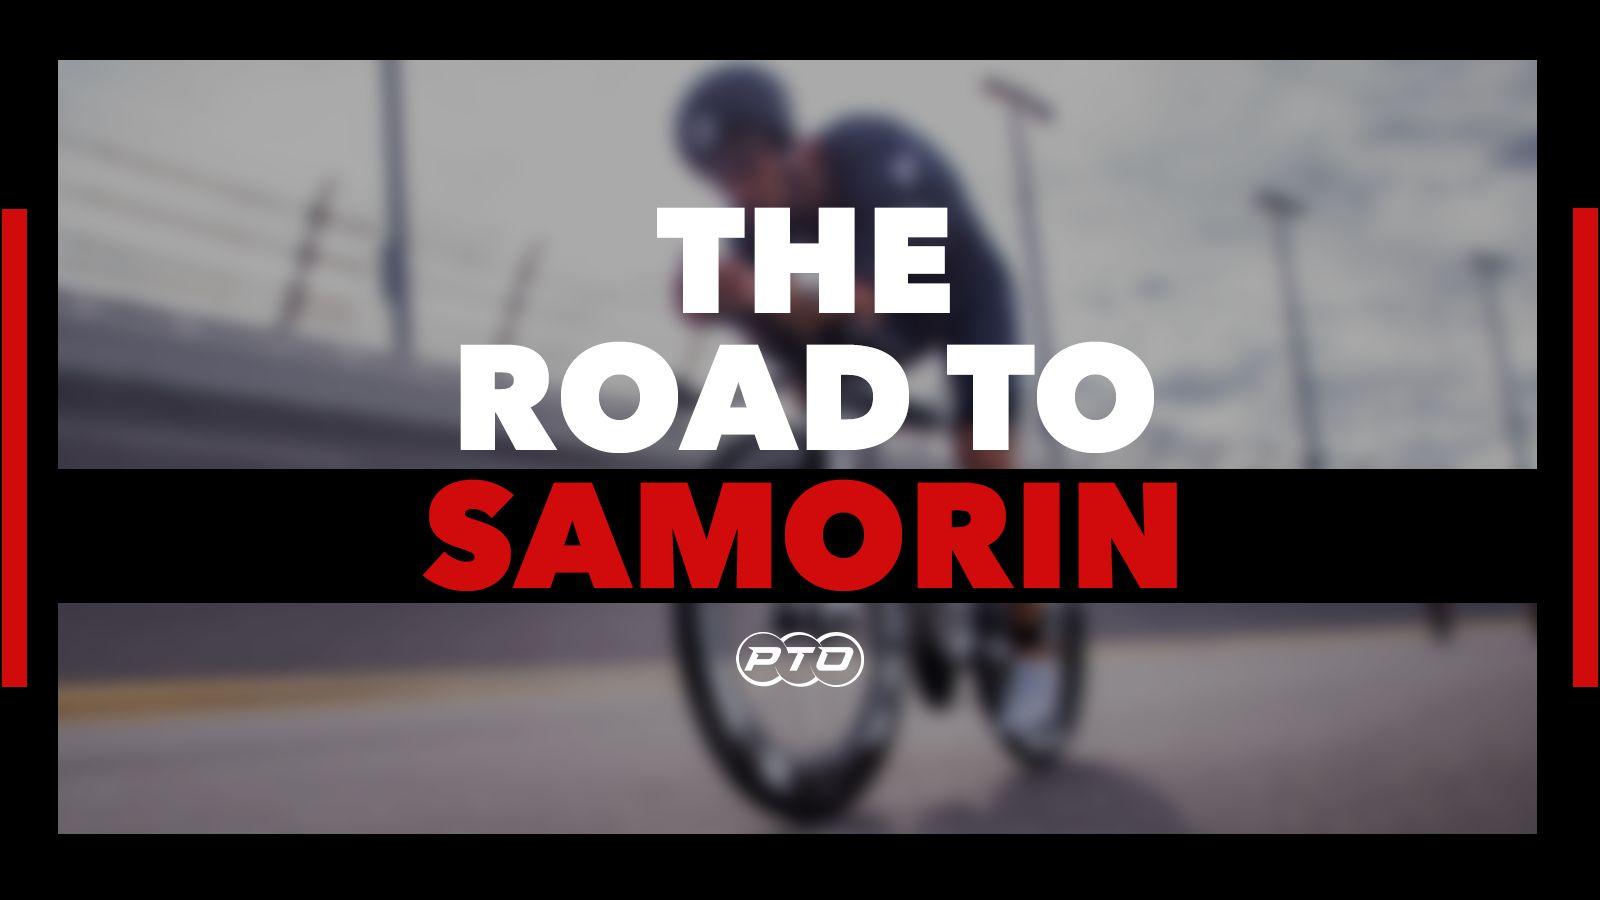 Collins Cup Lowdown: The road to Šamorín